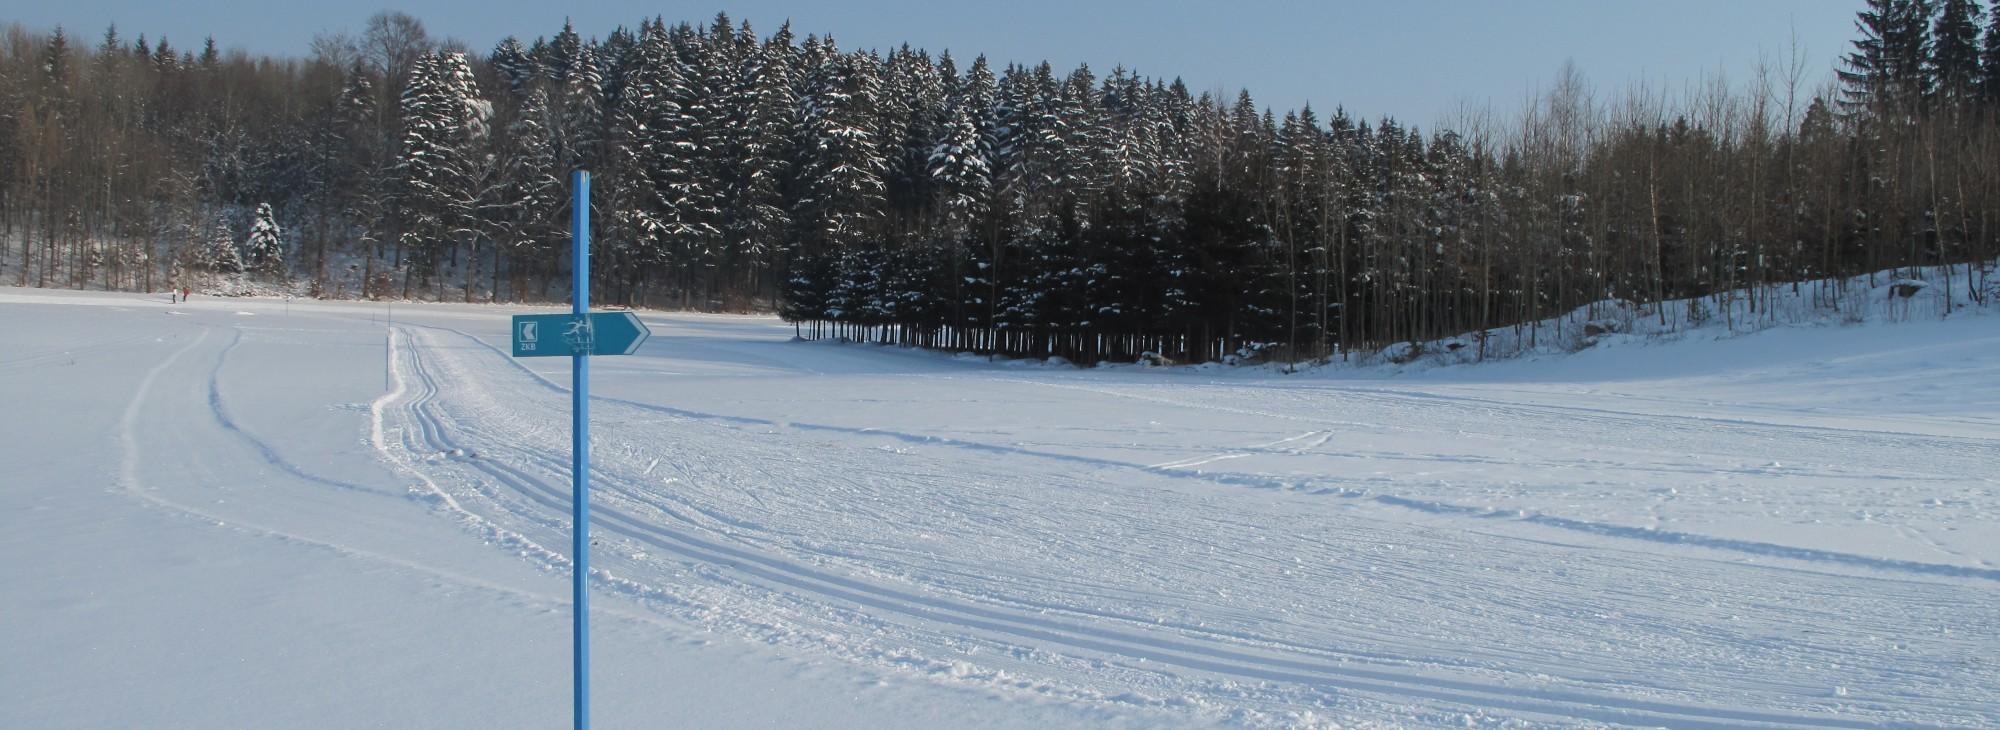 Langlaufclub Weisslingen